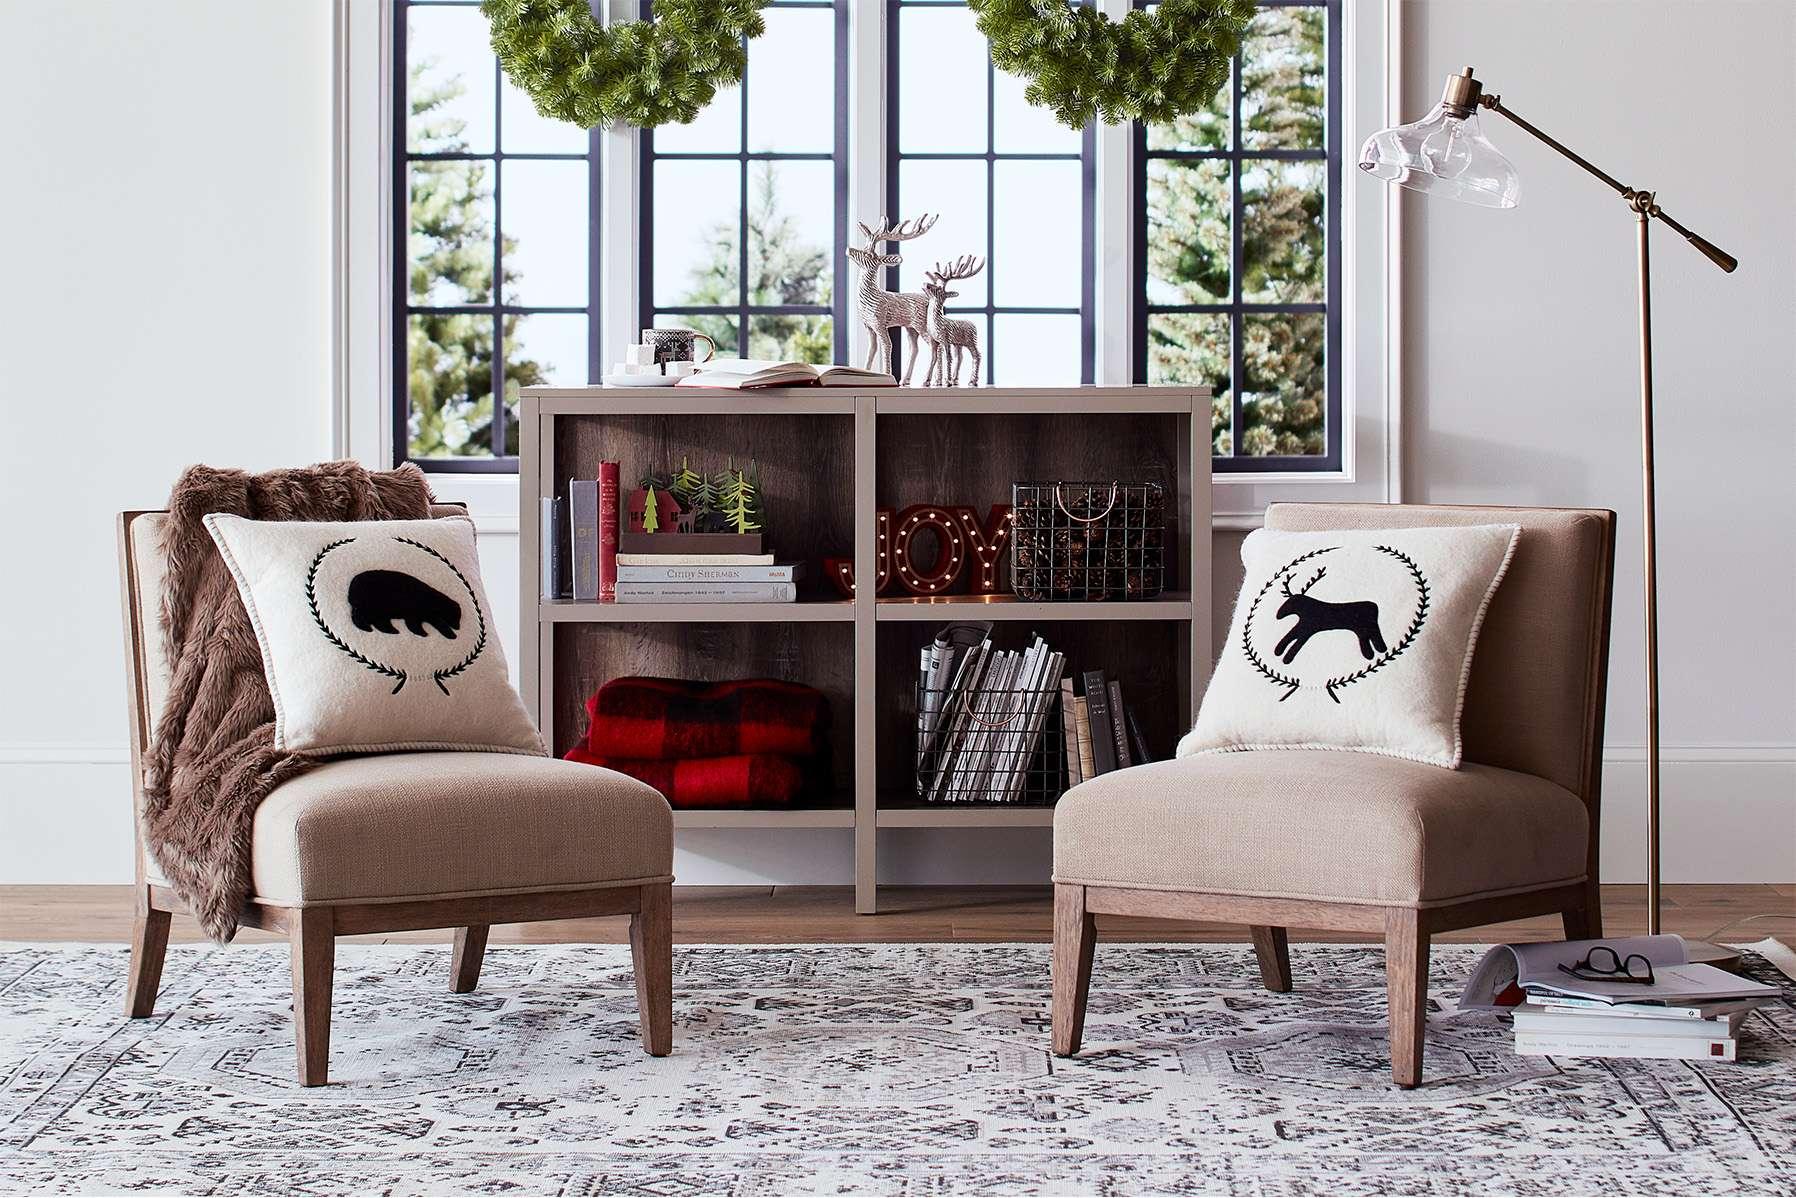 Threshold Holiday decor  Threshold living room furniture. Furniture Store   Target